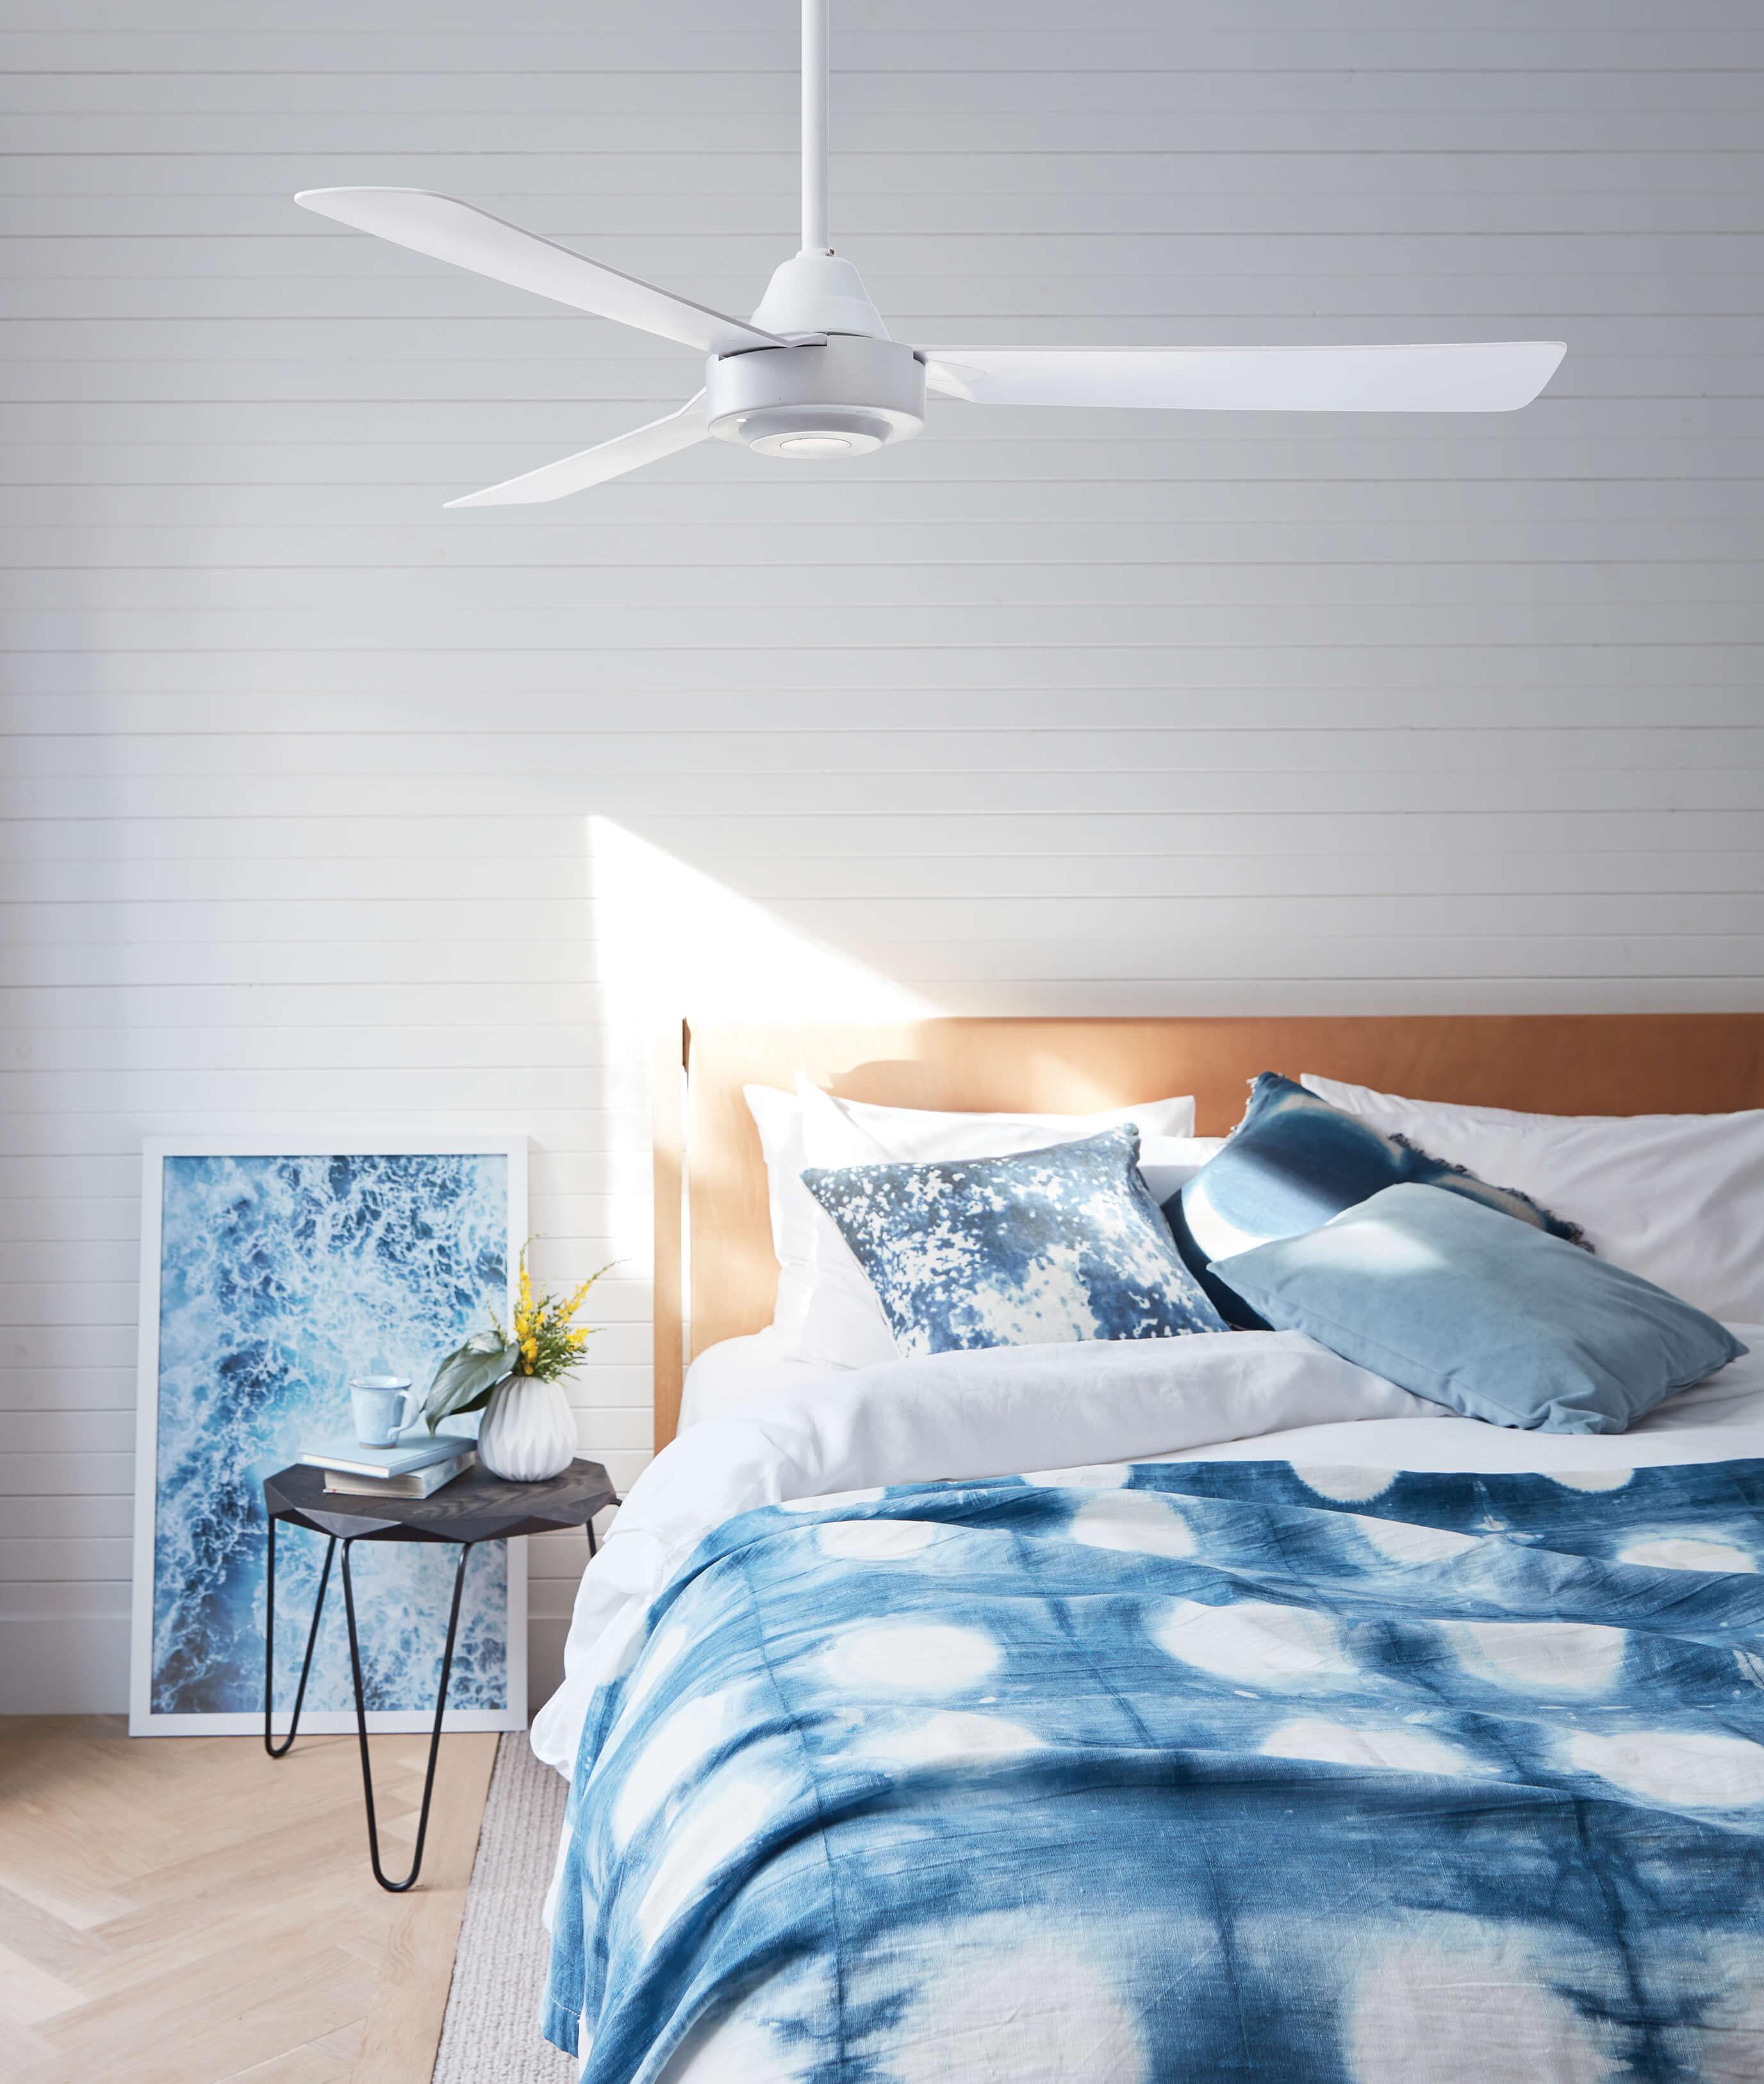 Ceiling Fan Bayside Calypso White 122cm 48 Quot Ceiling Fans